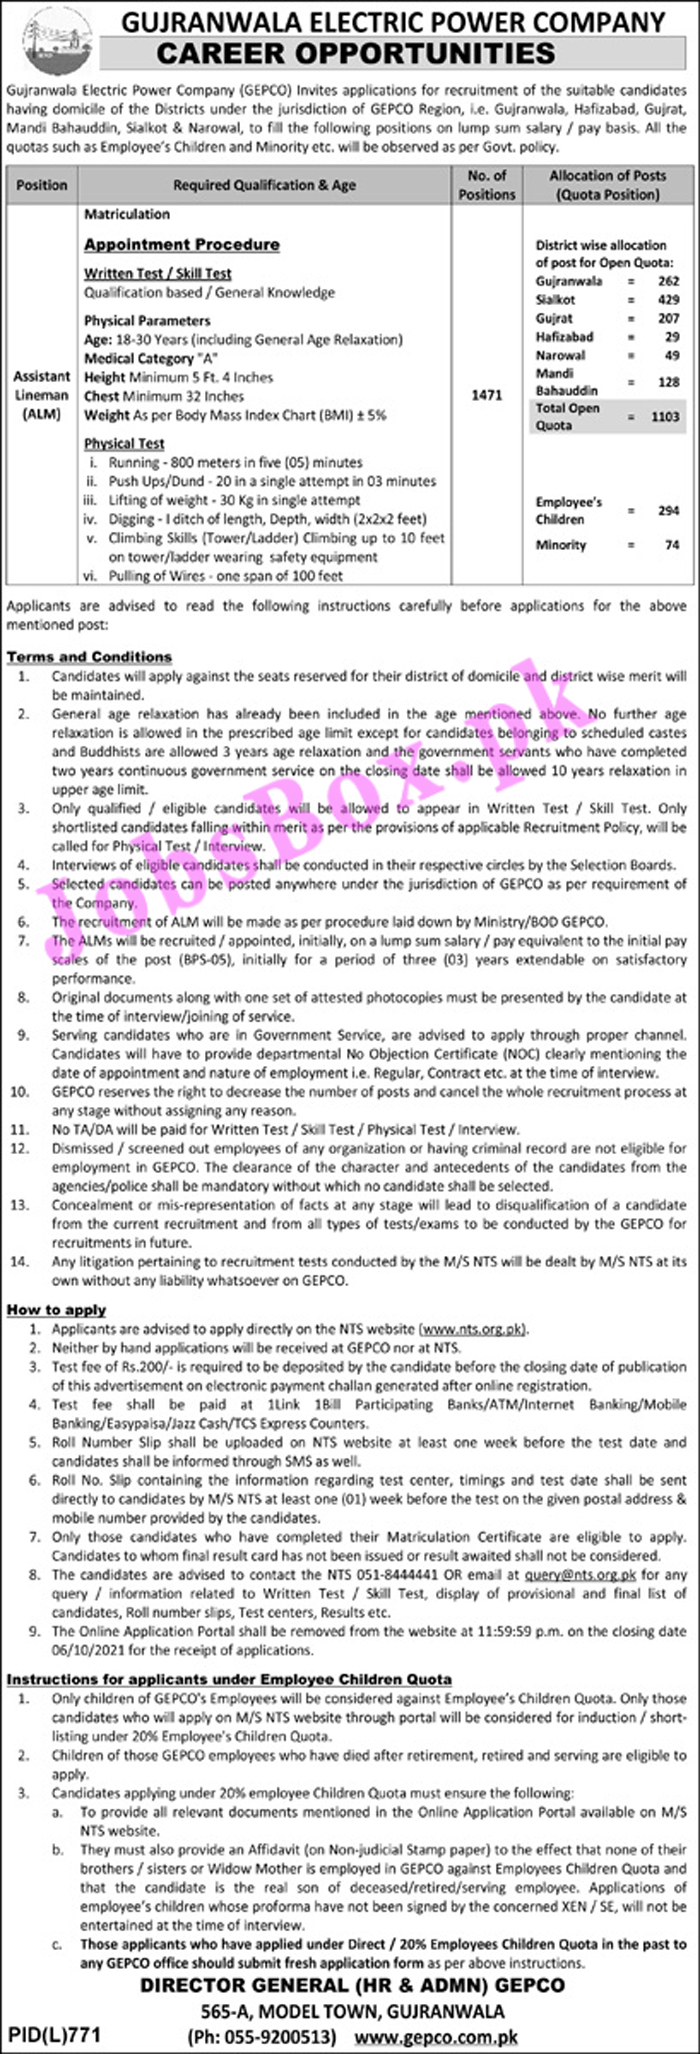 GEPCO Jobs 2021 | ALM Careers | NTS WAPDA Recruitment